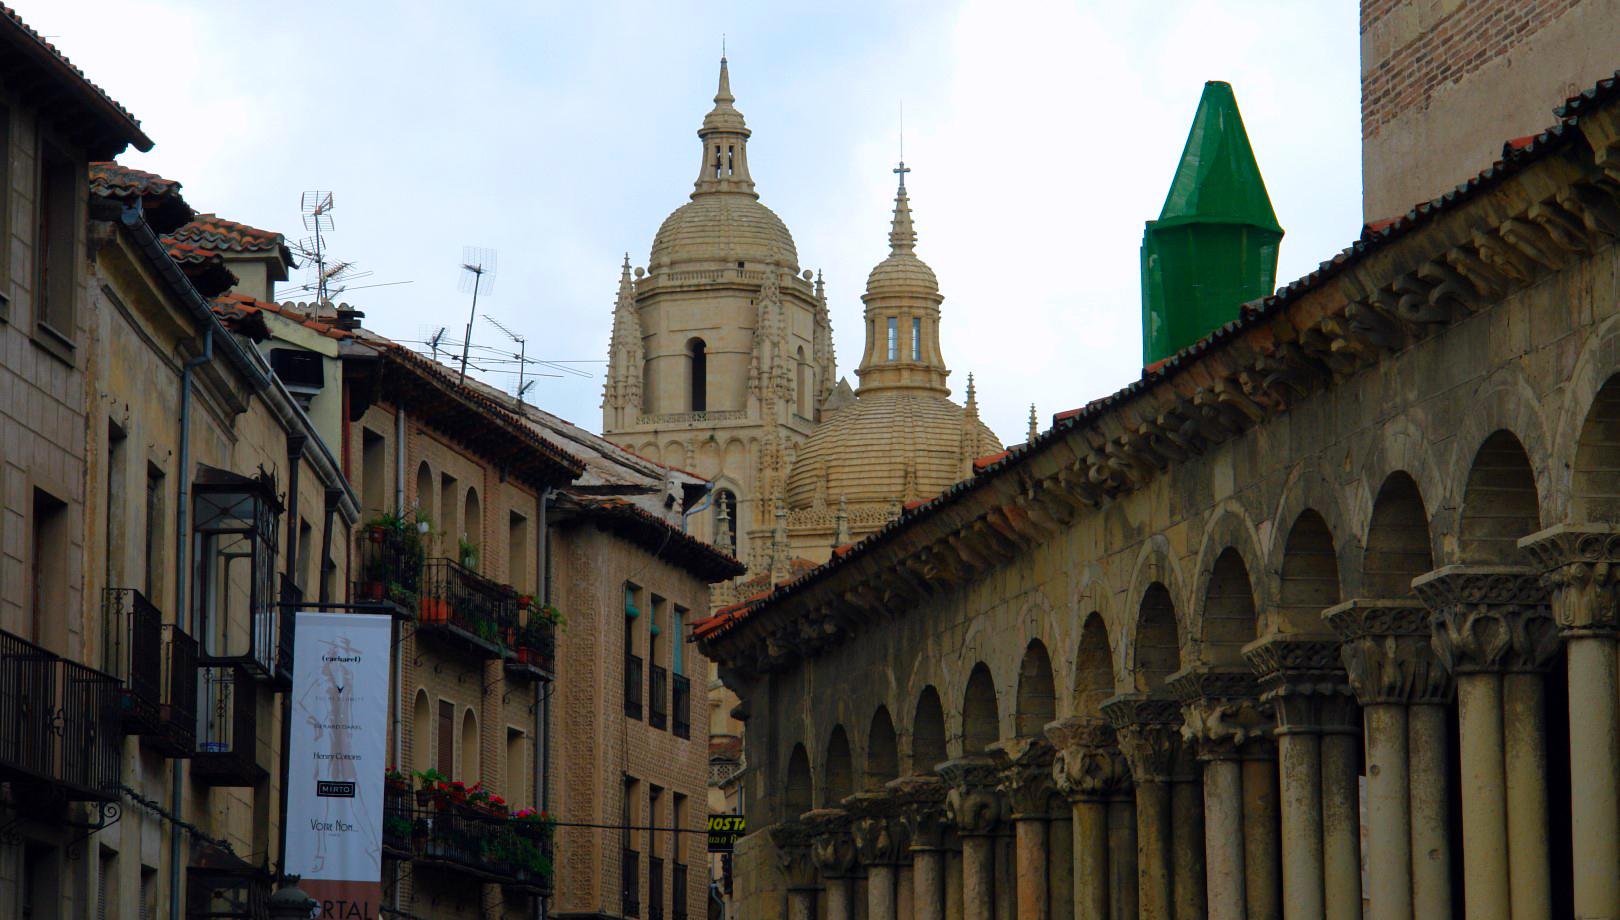 Qué ver Segovia, España qué ver en segovia - 31061926206 0766623e17 o - Qué ver en Segovia, España